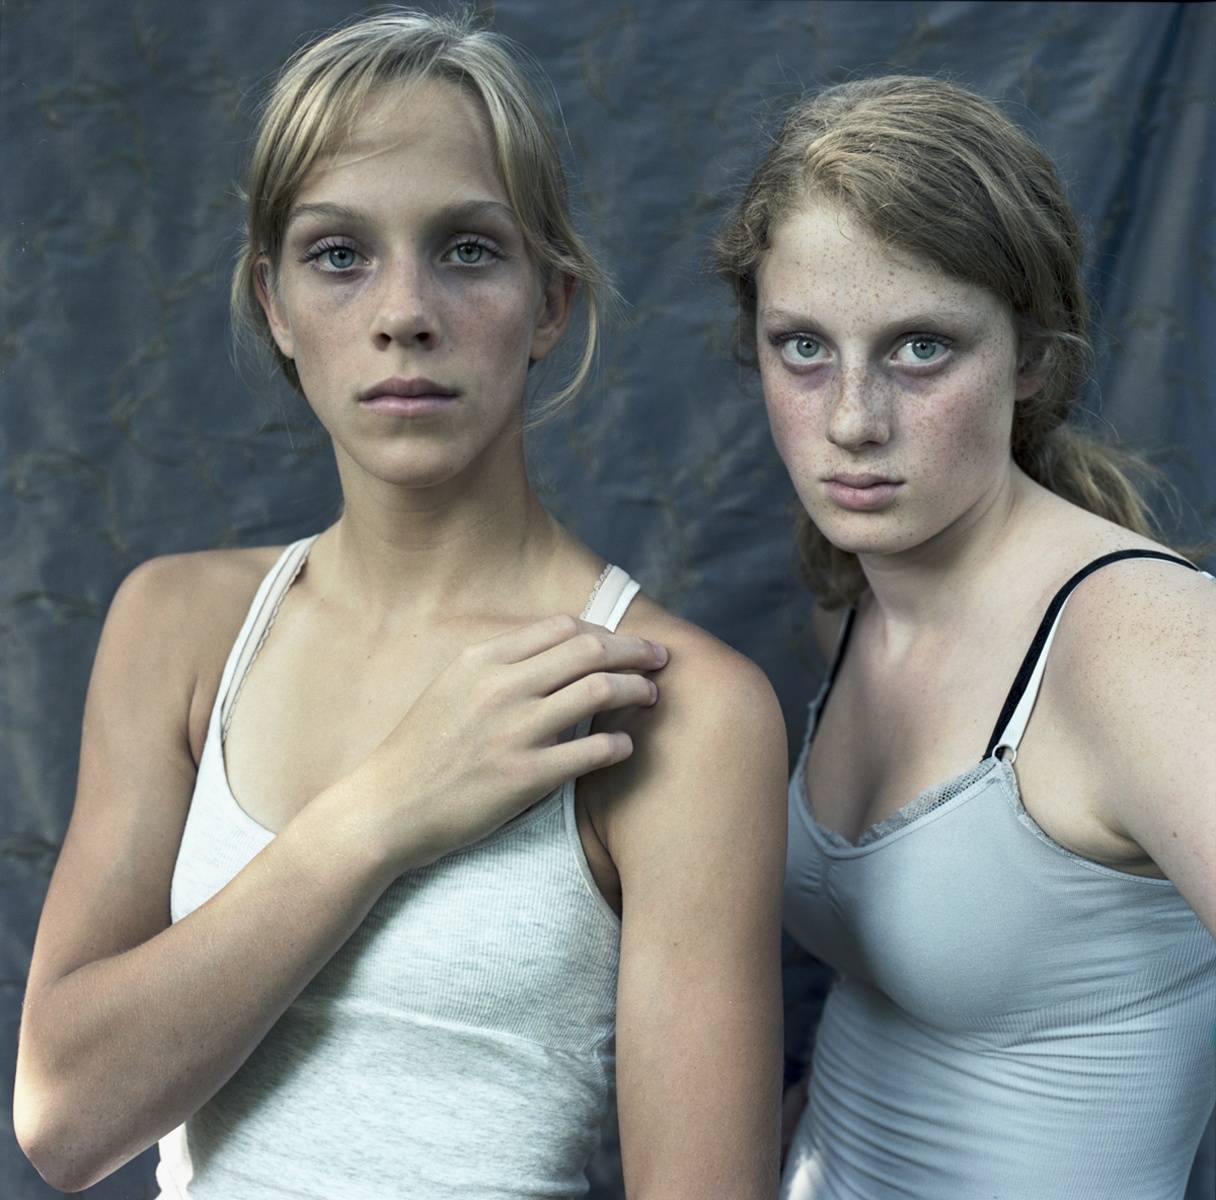 001_ Maria and Corinne